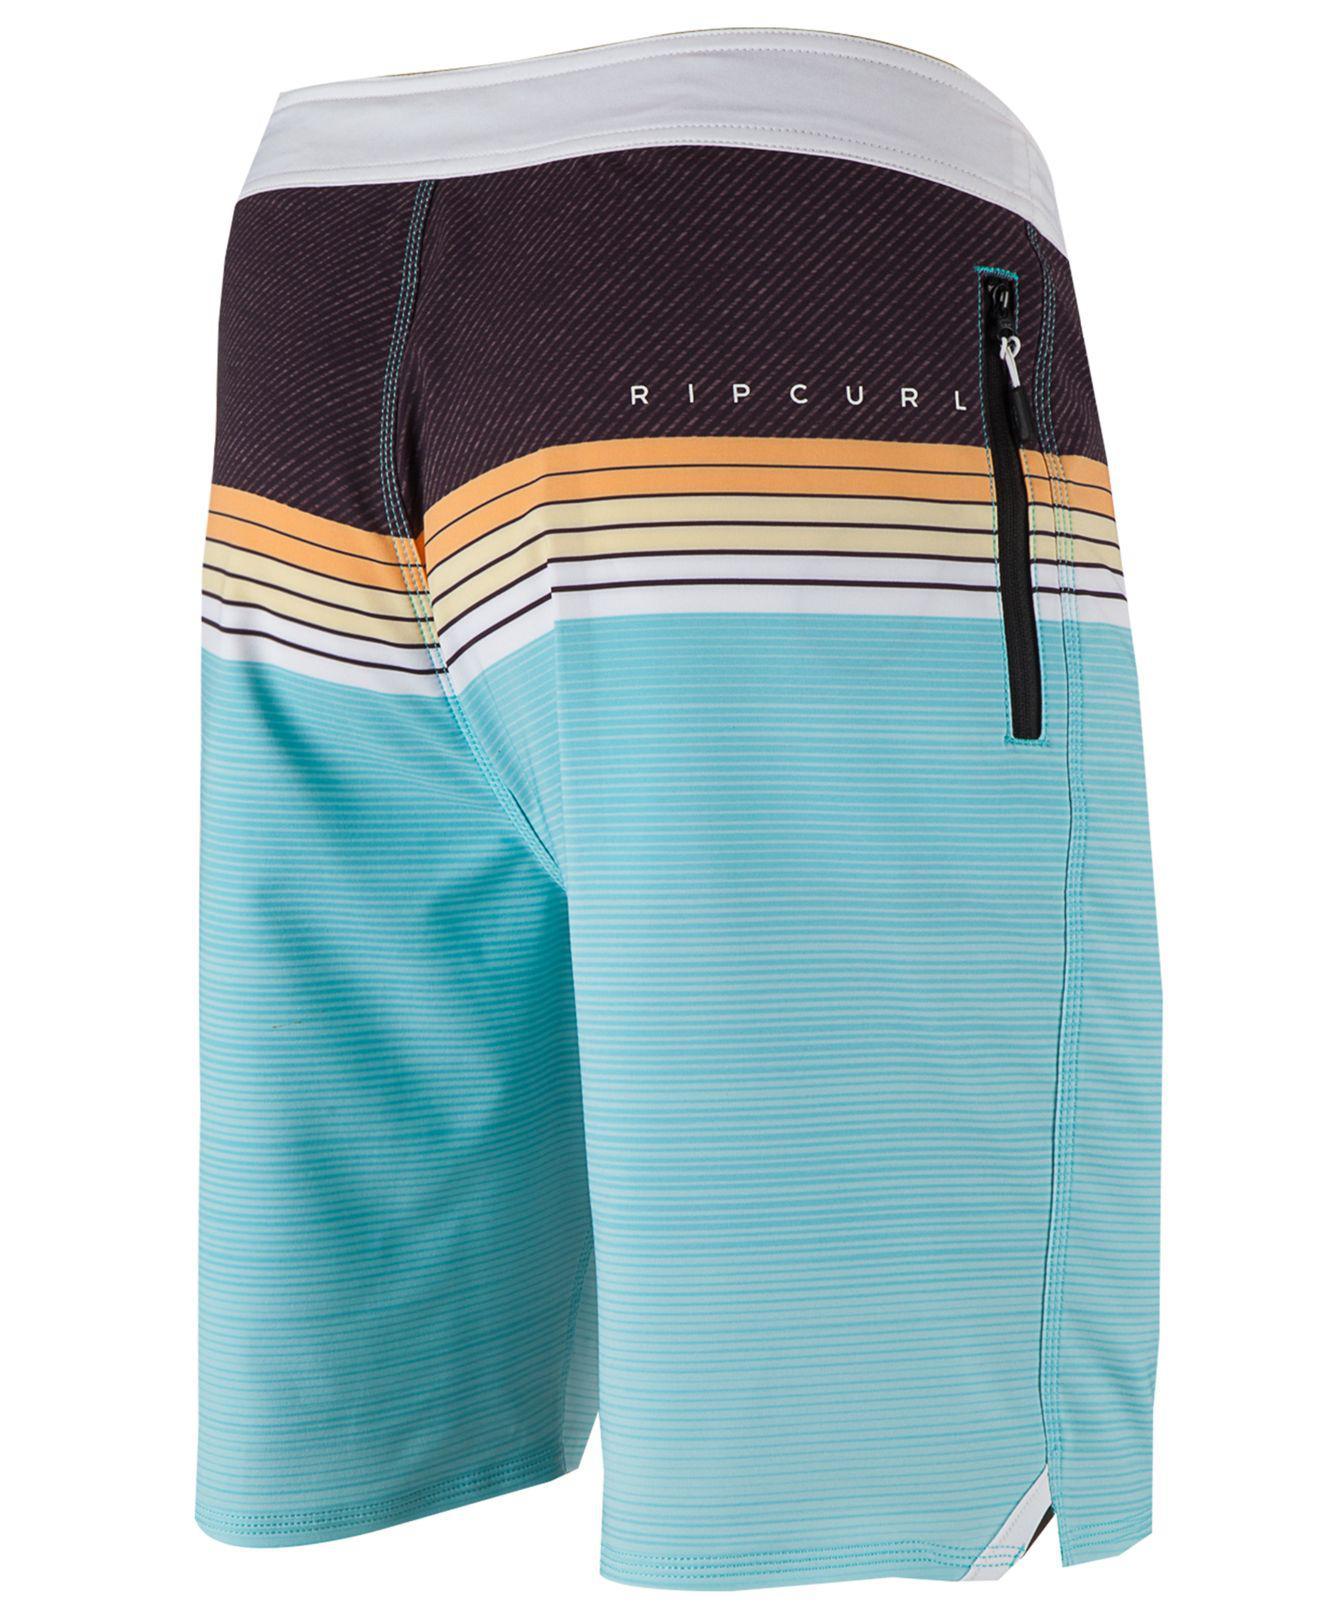 ee844a6b2e Swimwear, Surfwear & Wetsuits Rip Curl Mens Mirage Medina Edge Boardshort  Board Shorts